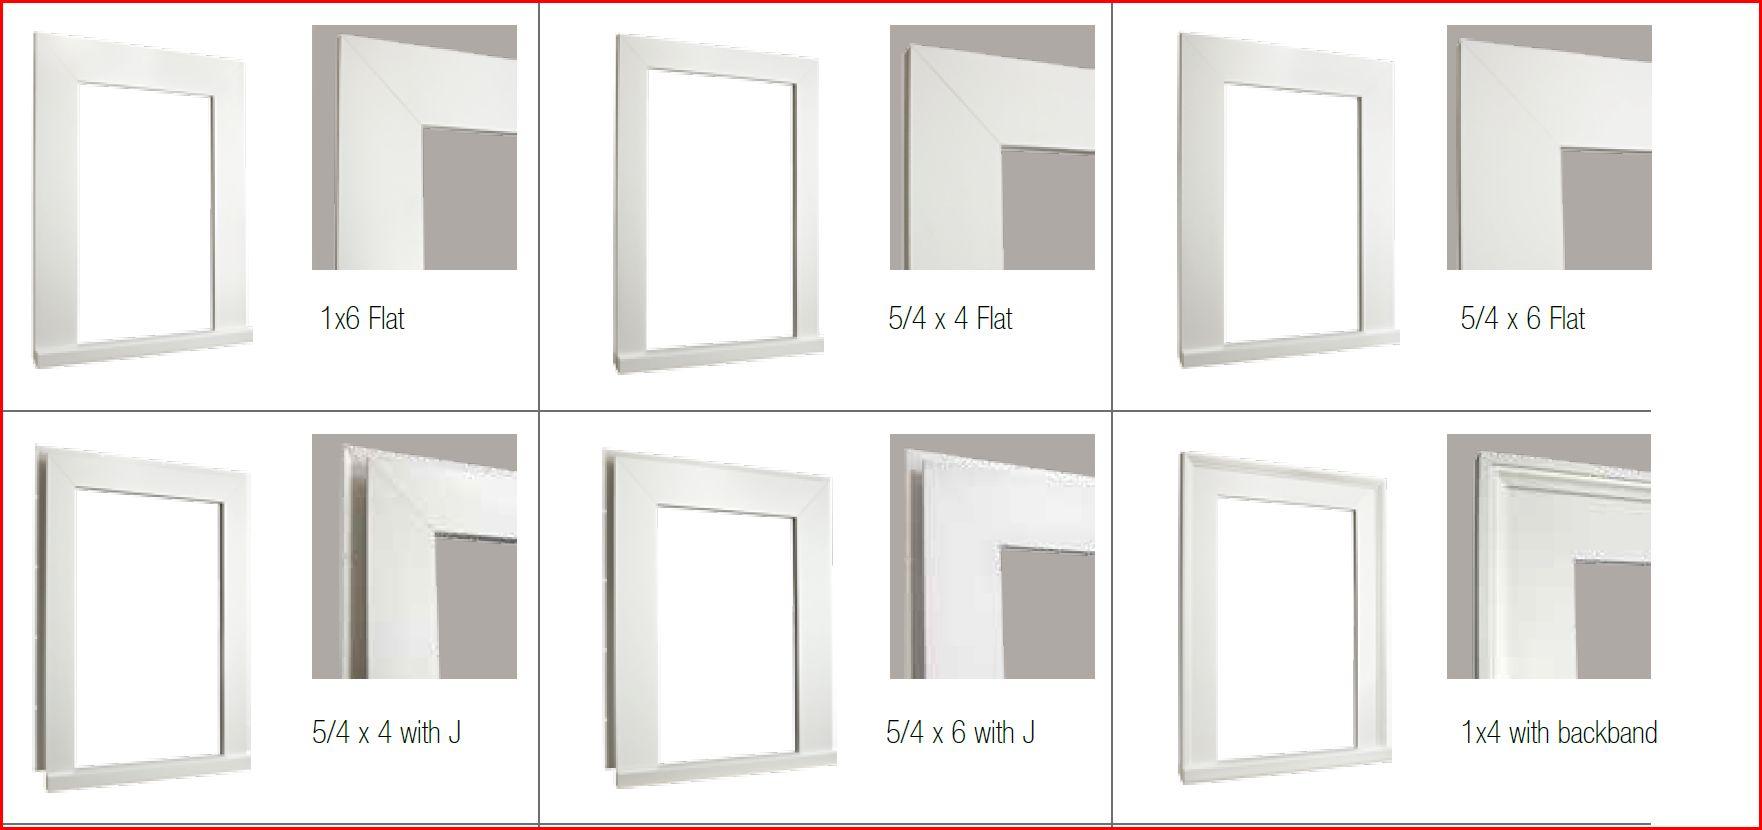 Anderson Windows Exterior Trim Windows Siding And Doors